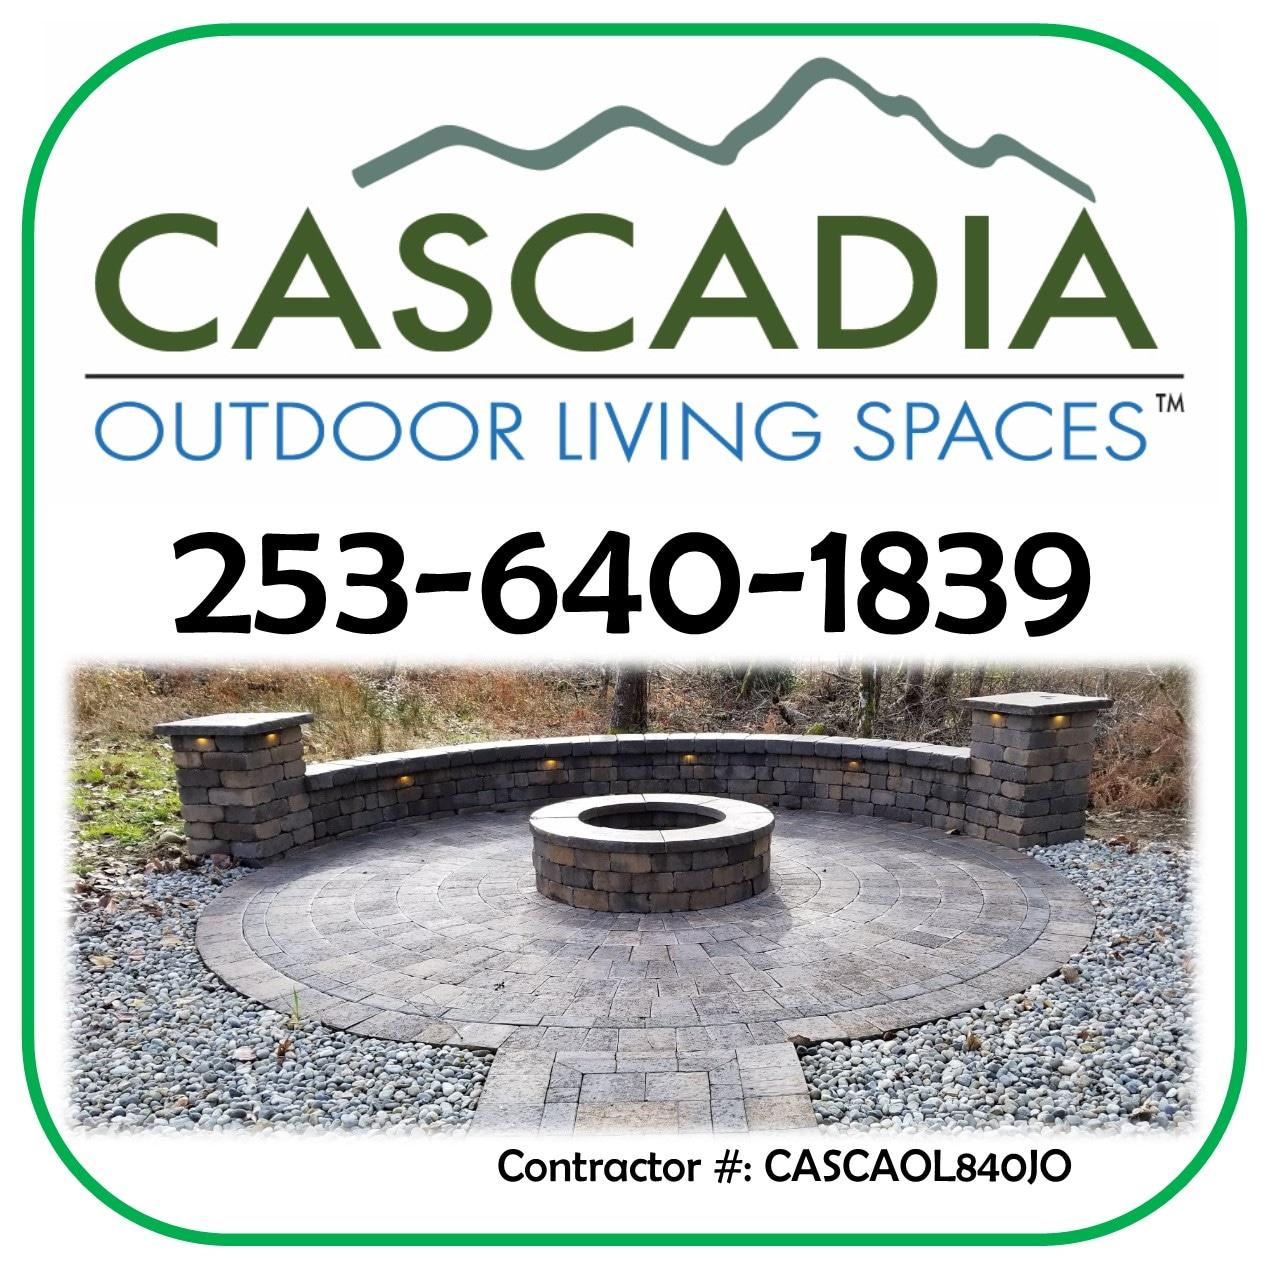 Top 10 Best Nurseries in Redmond WA | Angie's List on Cascadia Outdoor Living Spaces id=35423